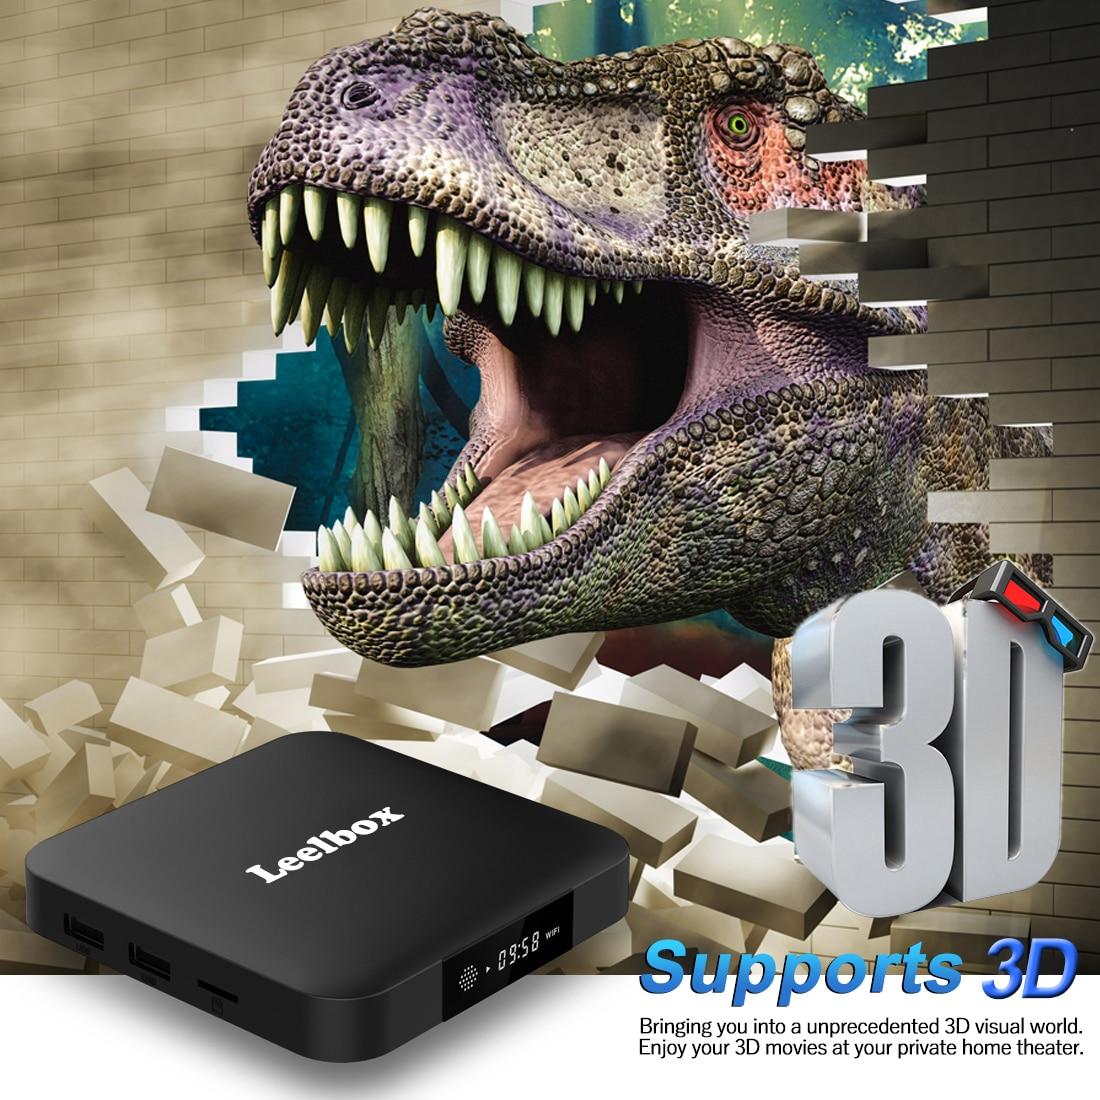 Image 3 - Leelbox Q2mini Android 8.1 Q2 mini s Smart TV BOX S905W Quad Core support 2.4G Wireless WIFI media box Set Top Box-in Set-top Boxes from Consumer Electronics